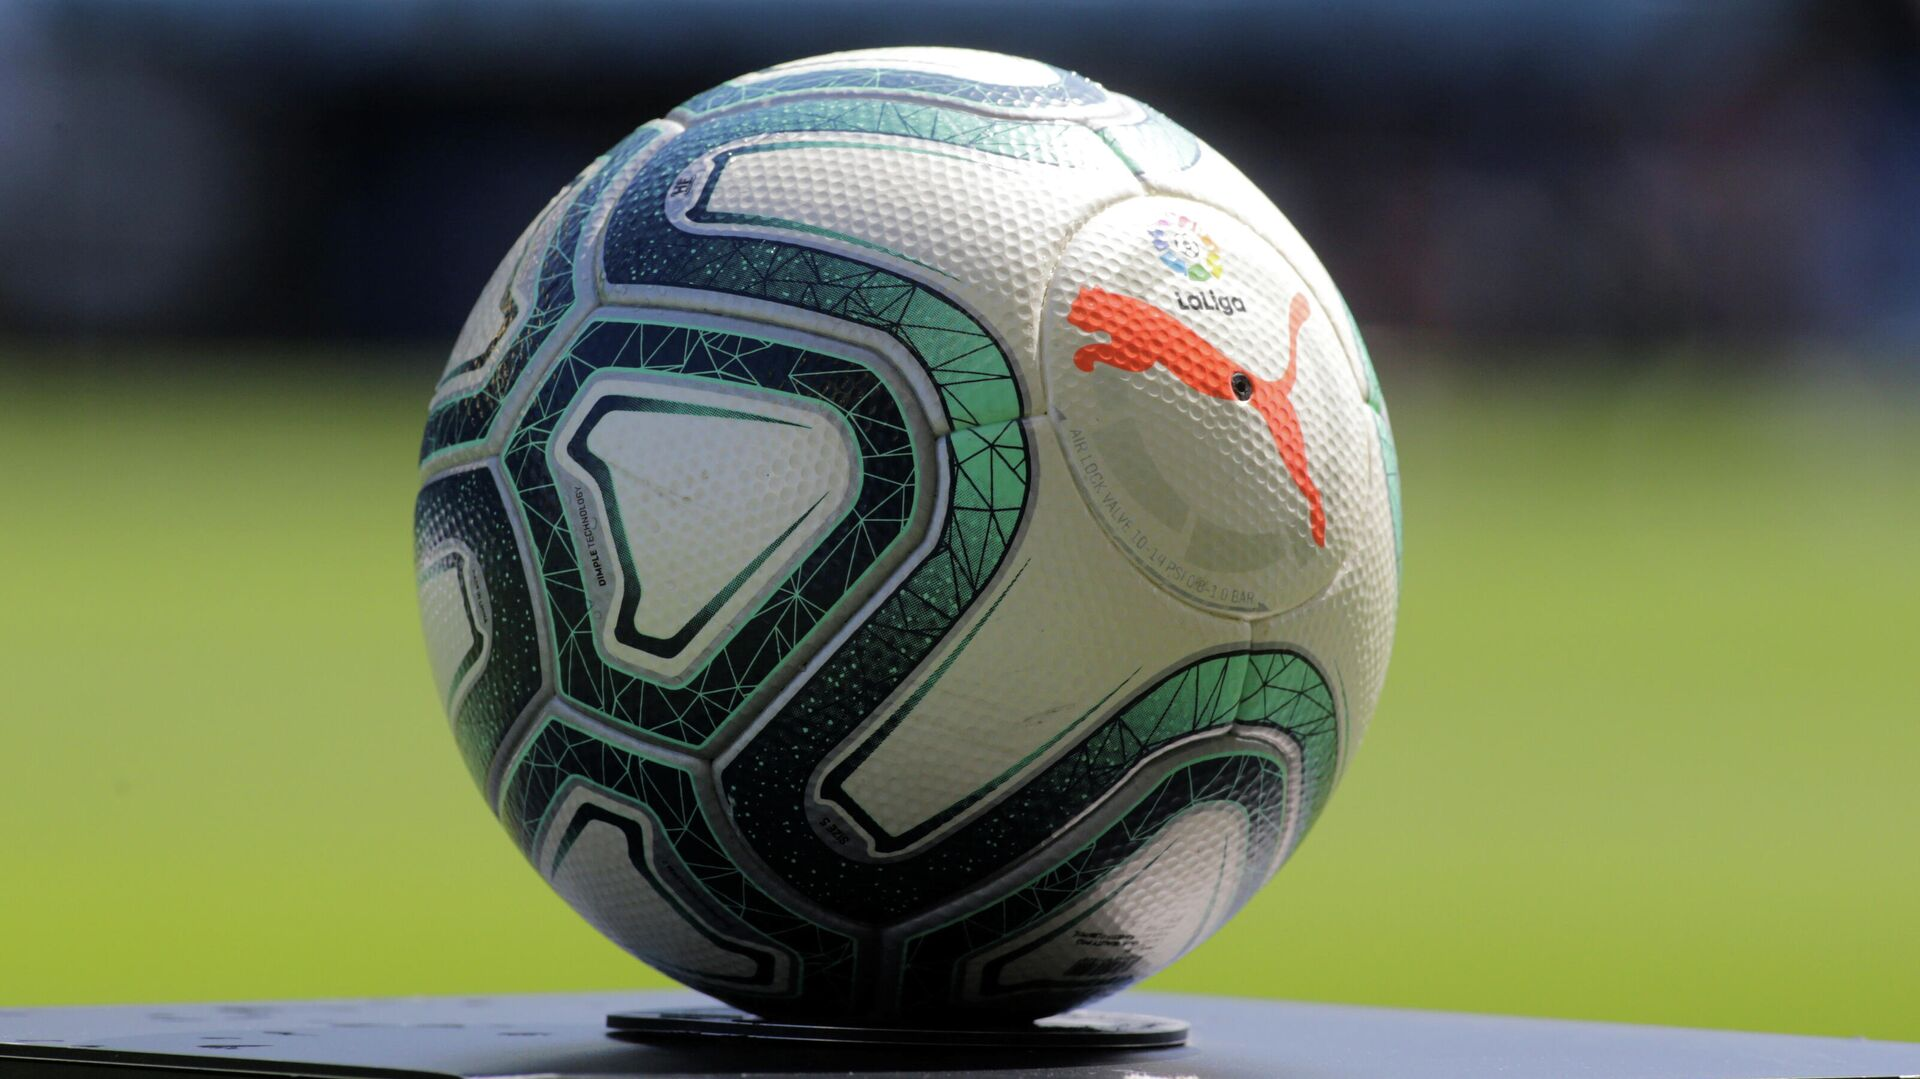 Официальный мяч чемпионата Испании по футболу - РИА Новости, 1920, 08.09.2020